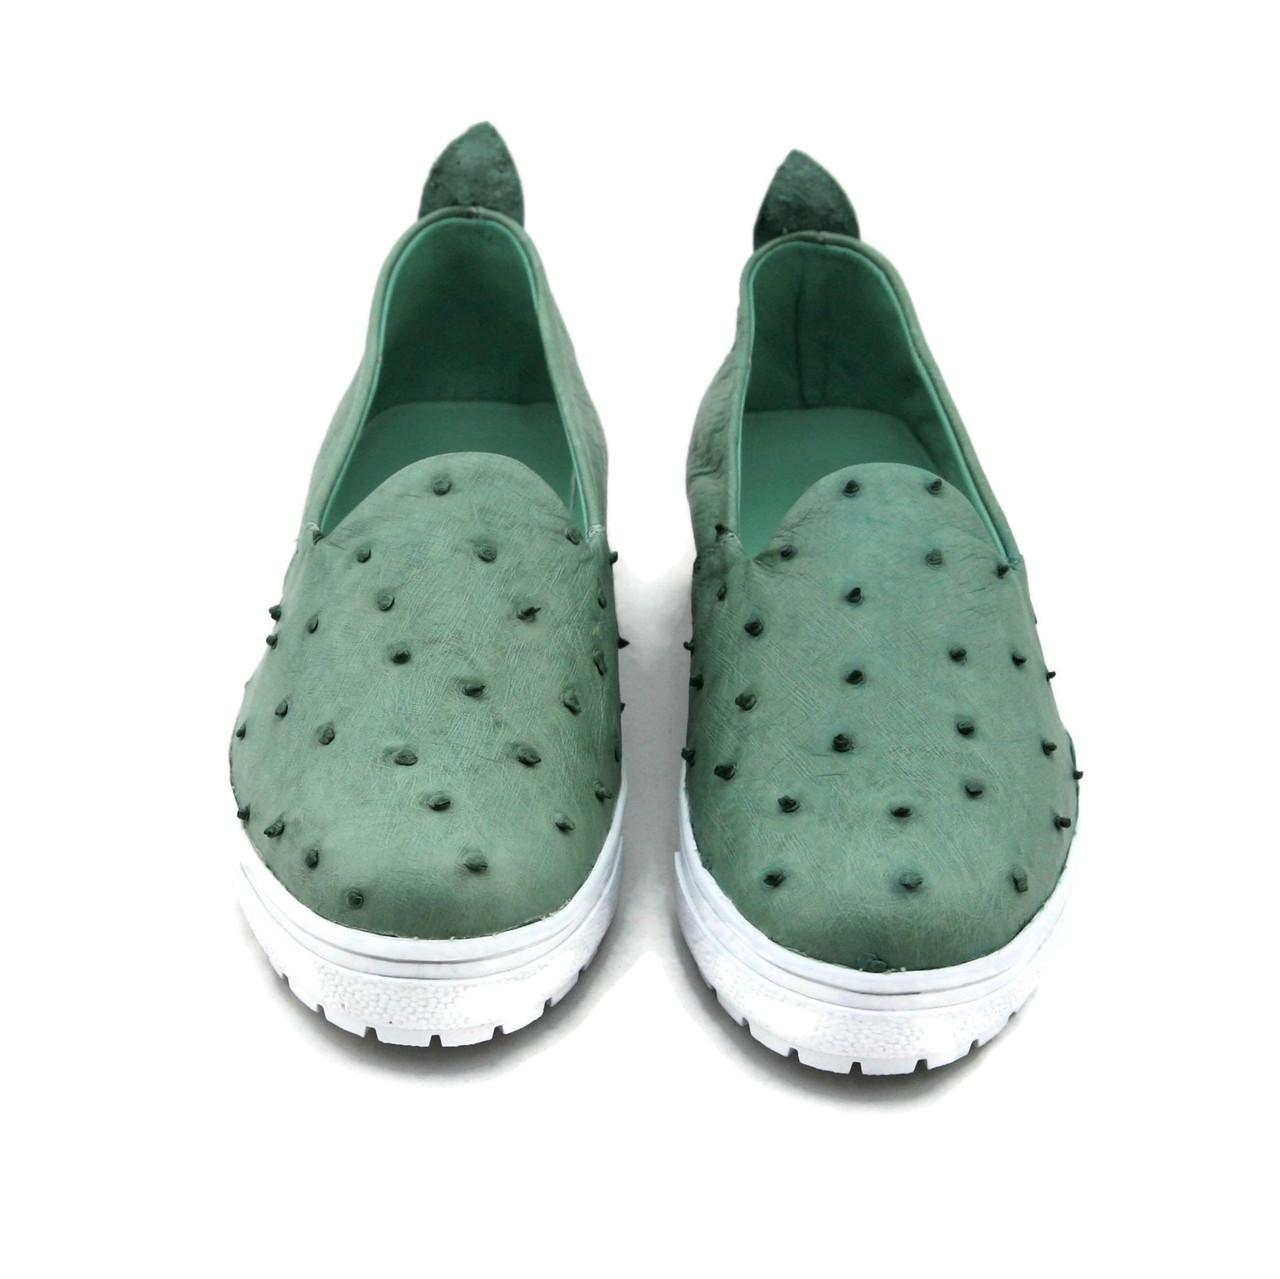 ostrich tennis shoes